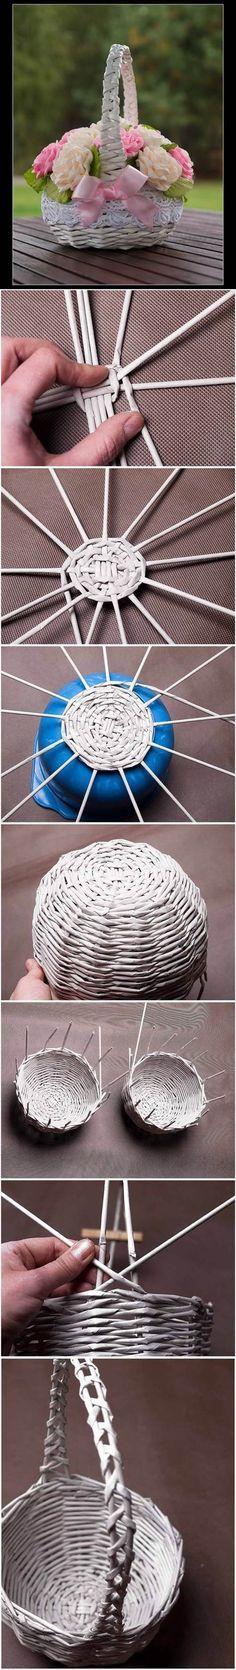 DIY Newspaper Tubes Weaving Basket | iCreativeIdeas.com Follow Us on Facebook --> https://www.facebook.com/icreativeideas